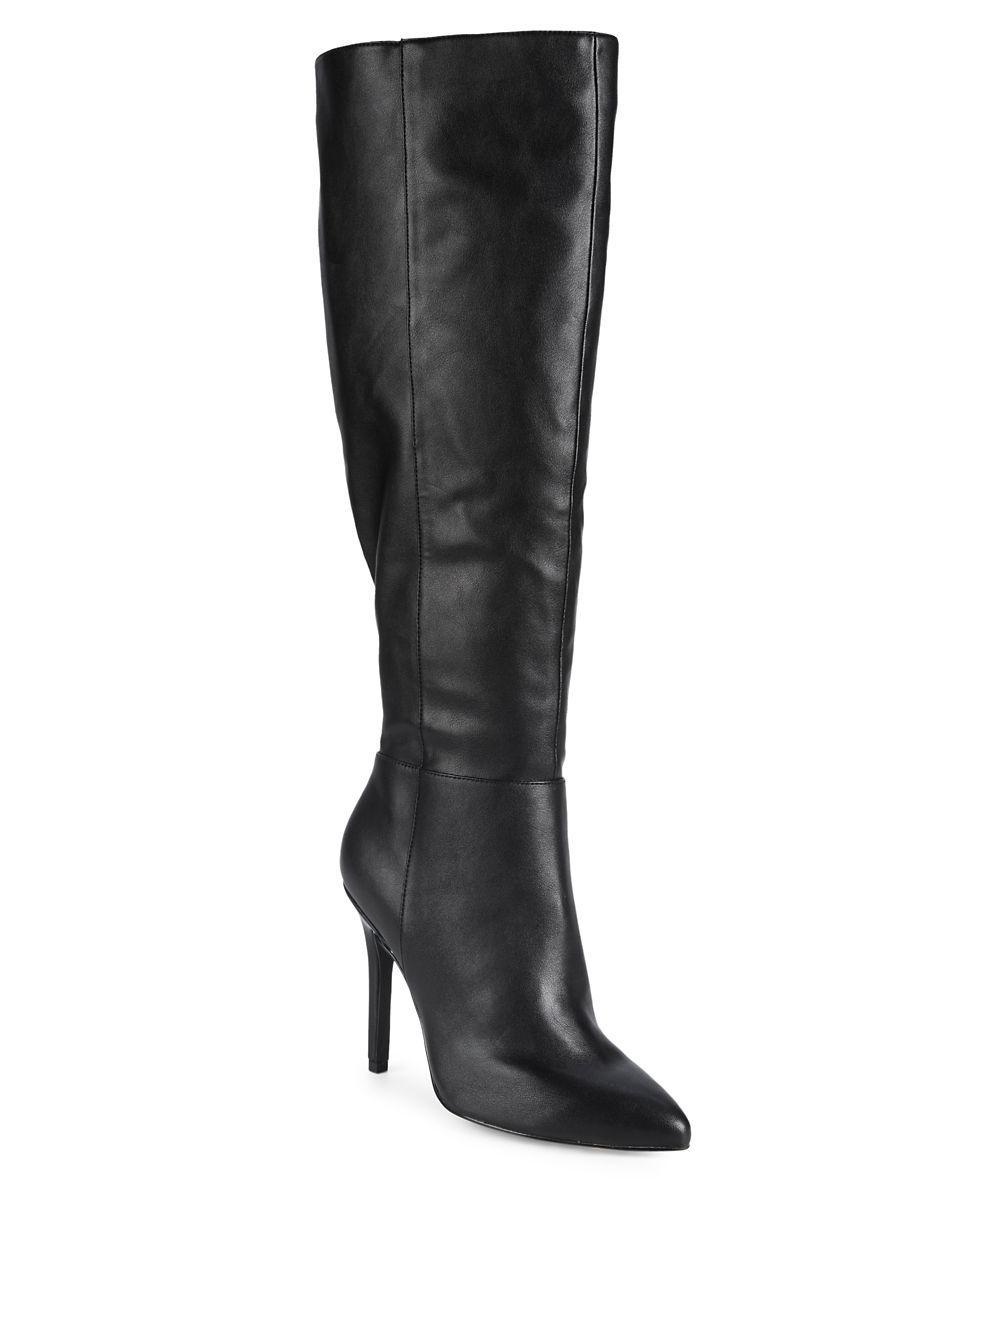 6ff6ab998db Lyst - Charles David Dallen Point Toe Tall Boots in Black